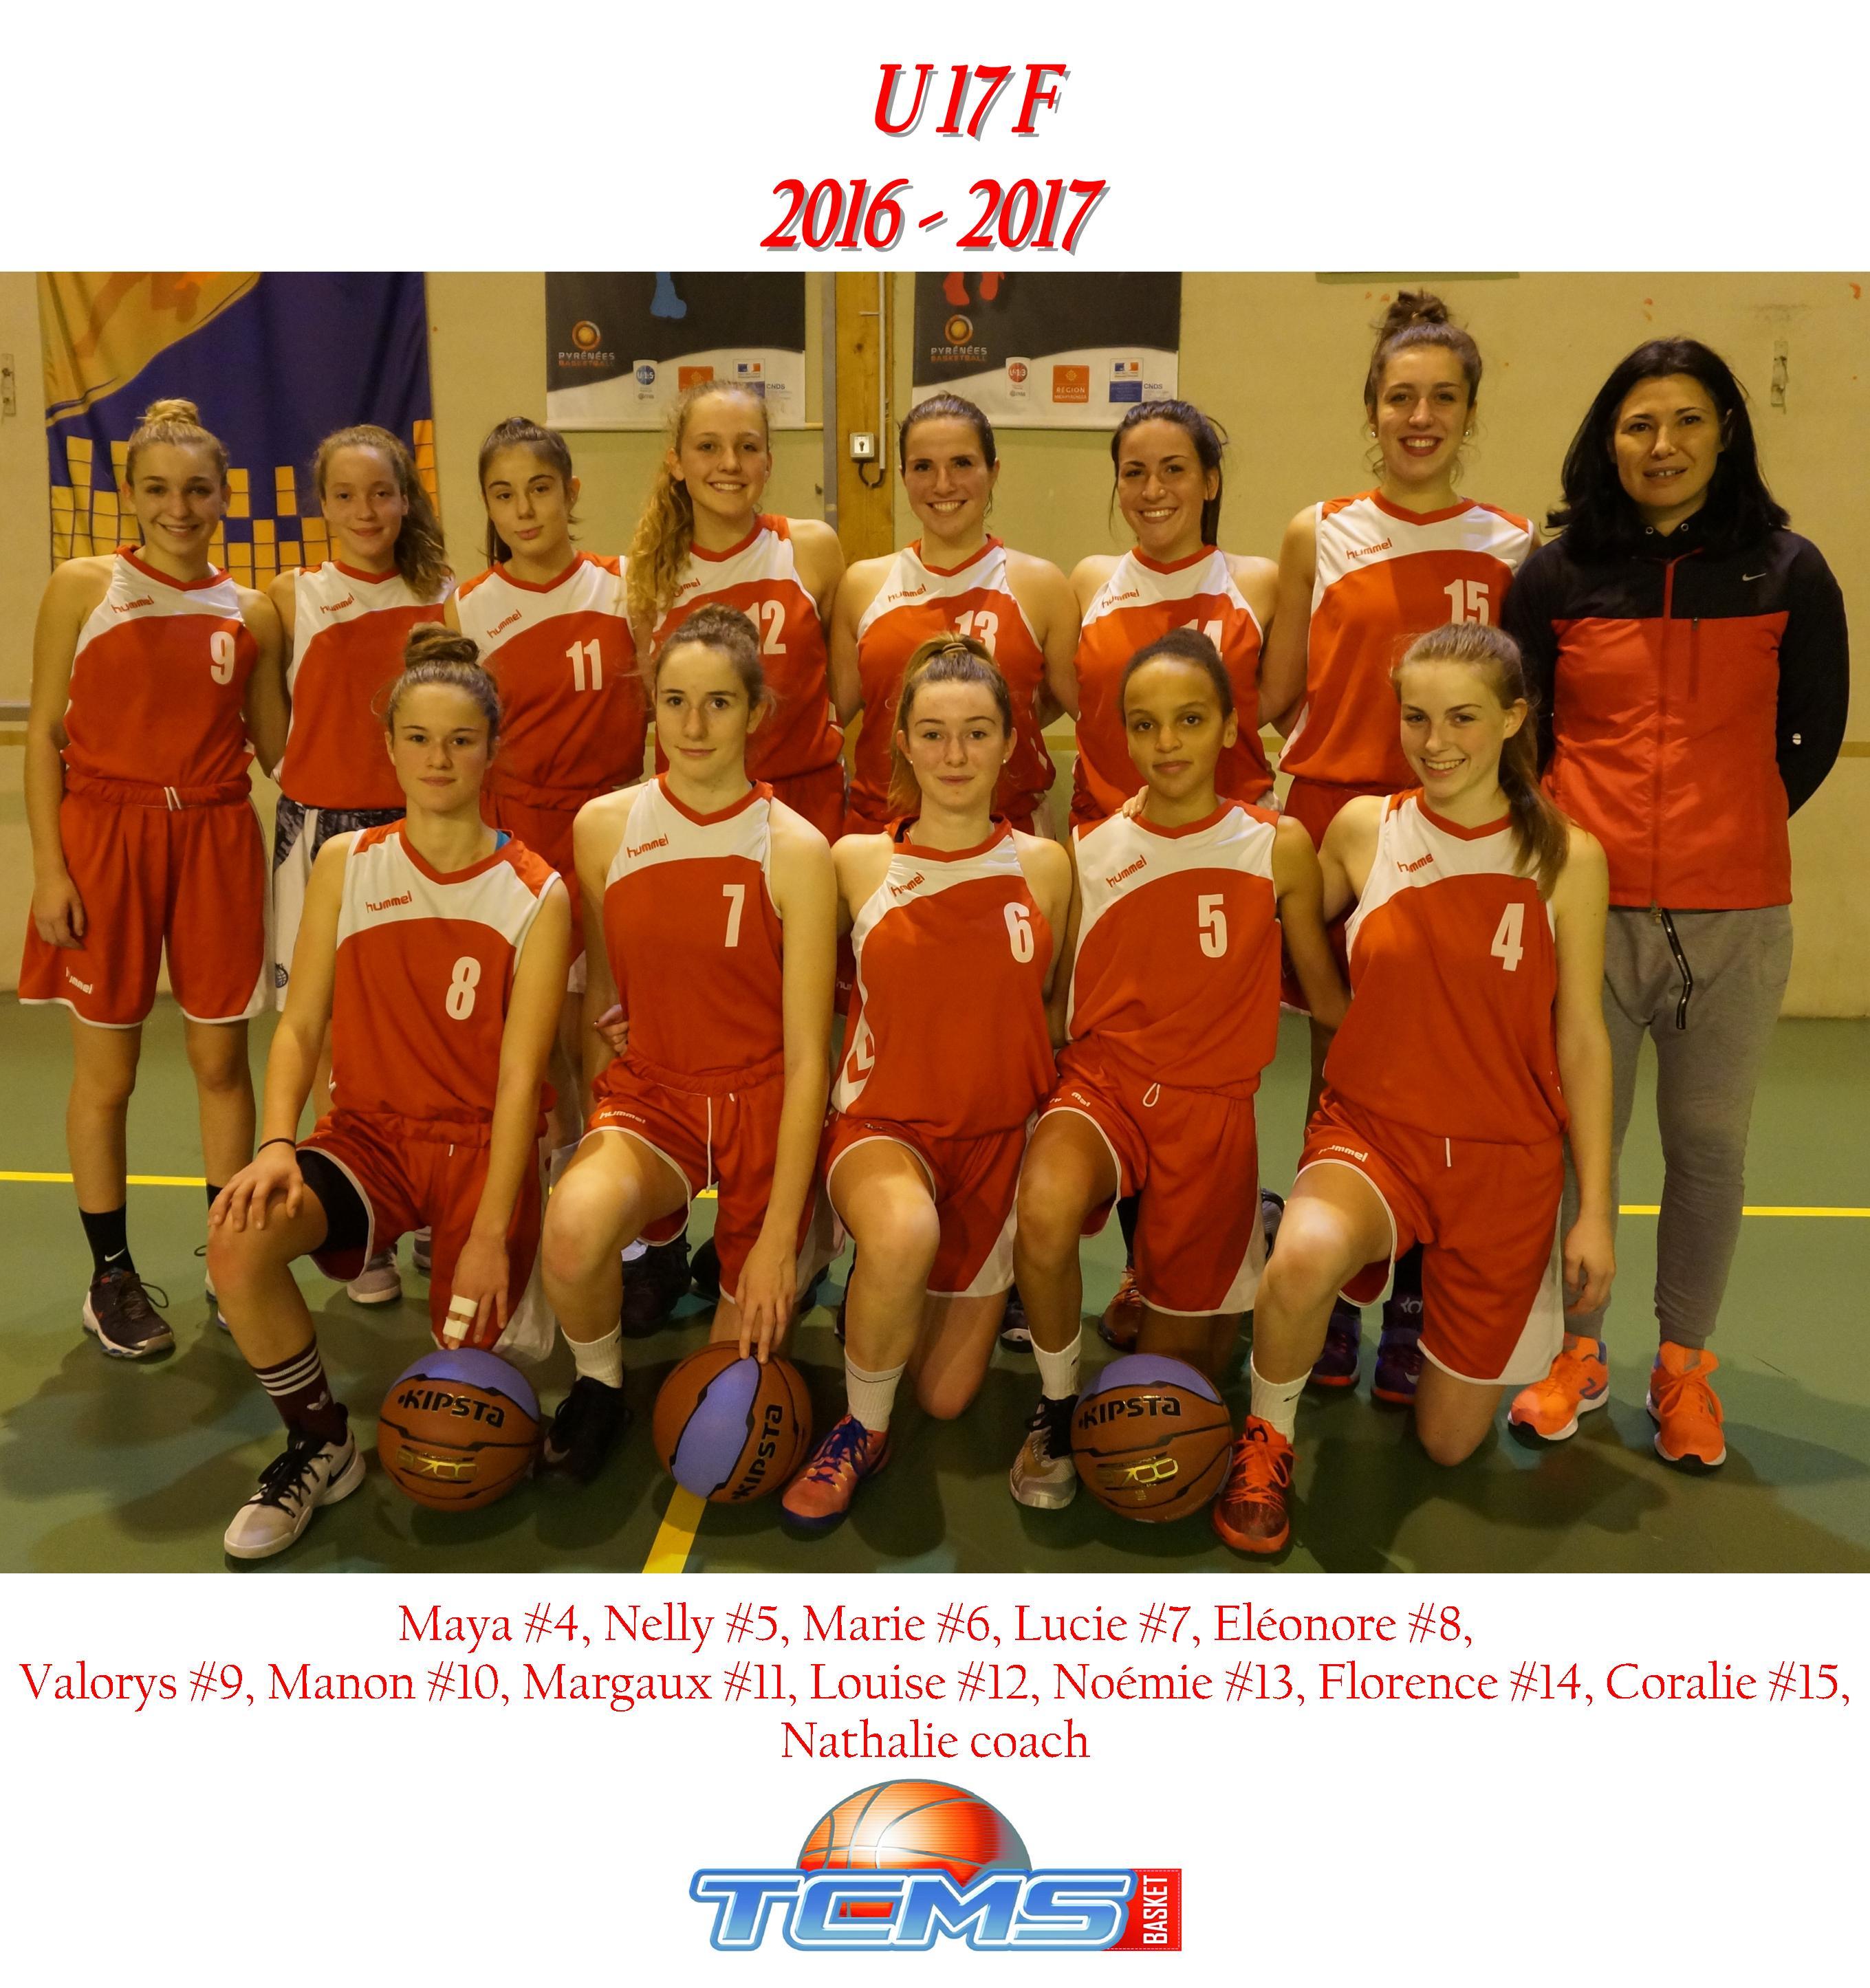 Photo Équipe U17F / Saison 2016-2017